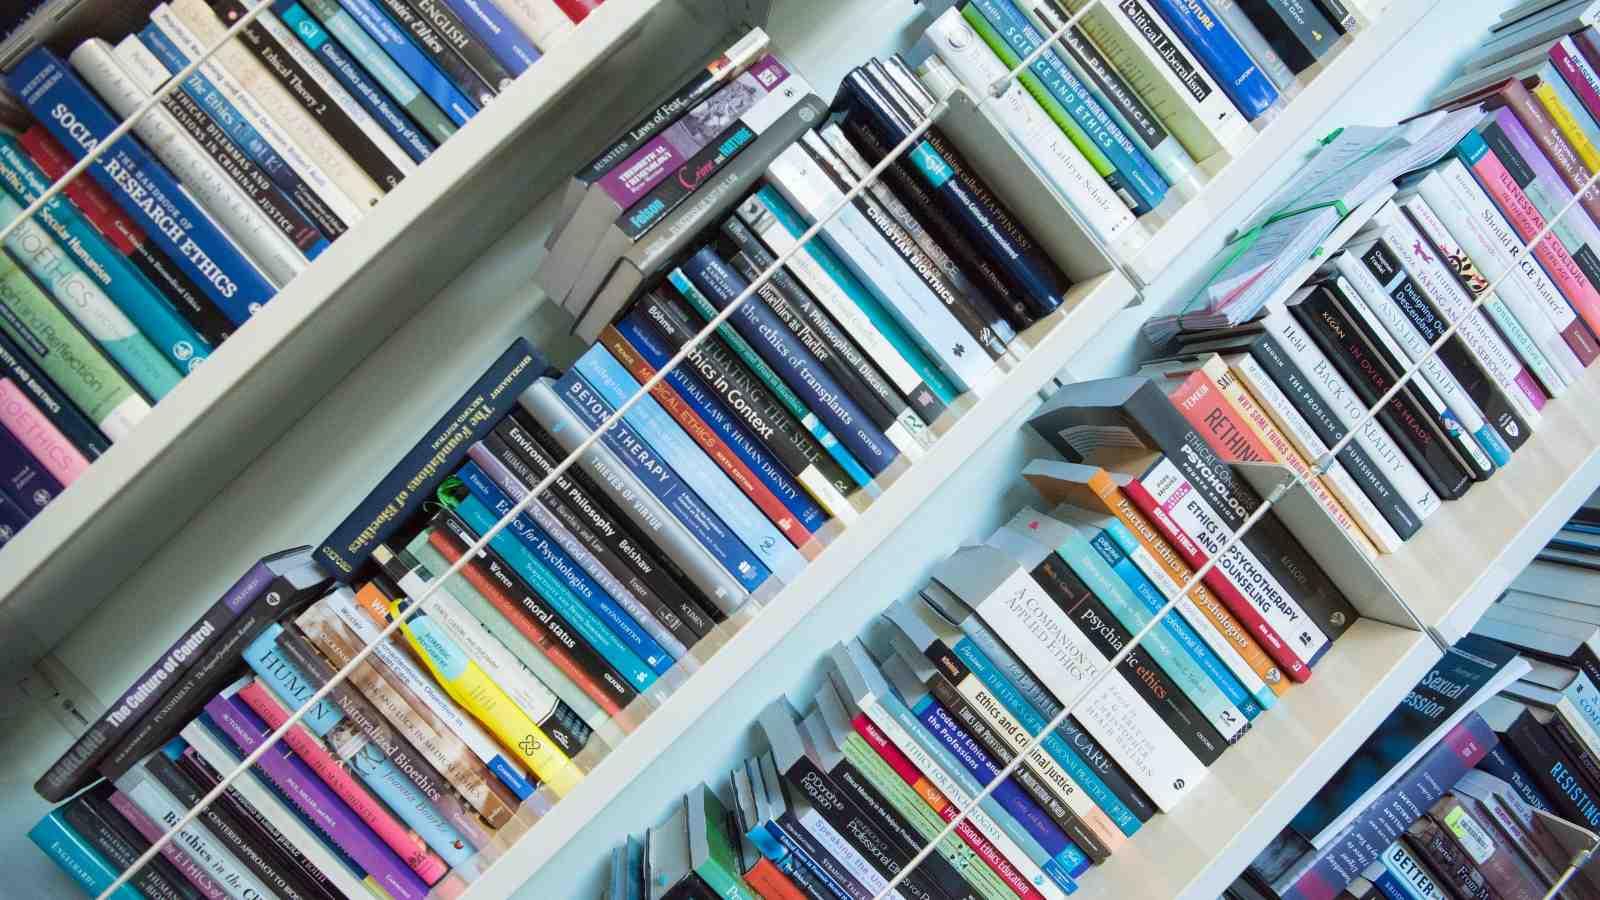 theoretical psychology books on a shelf